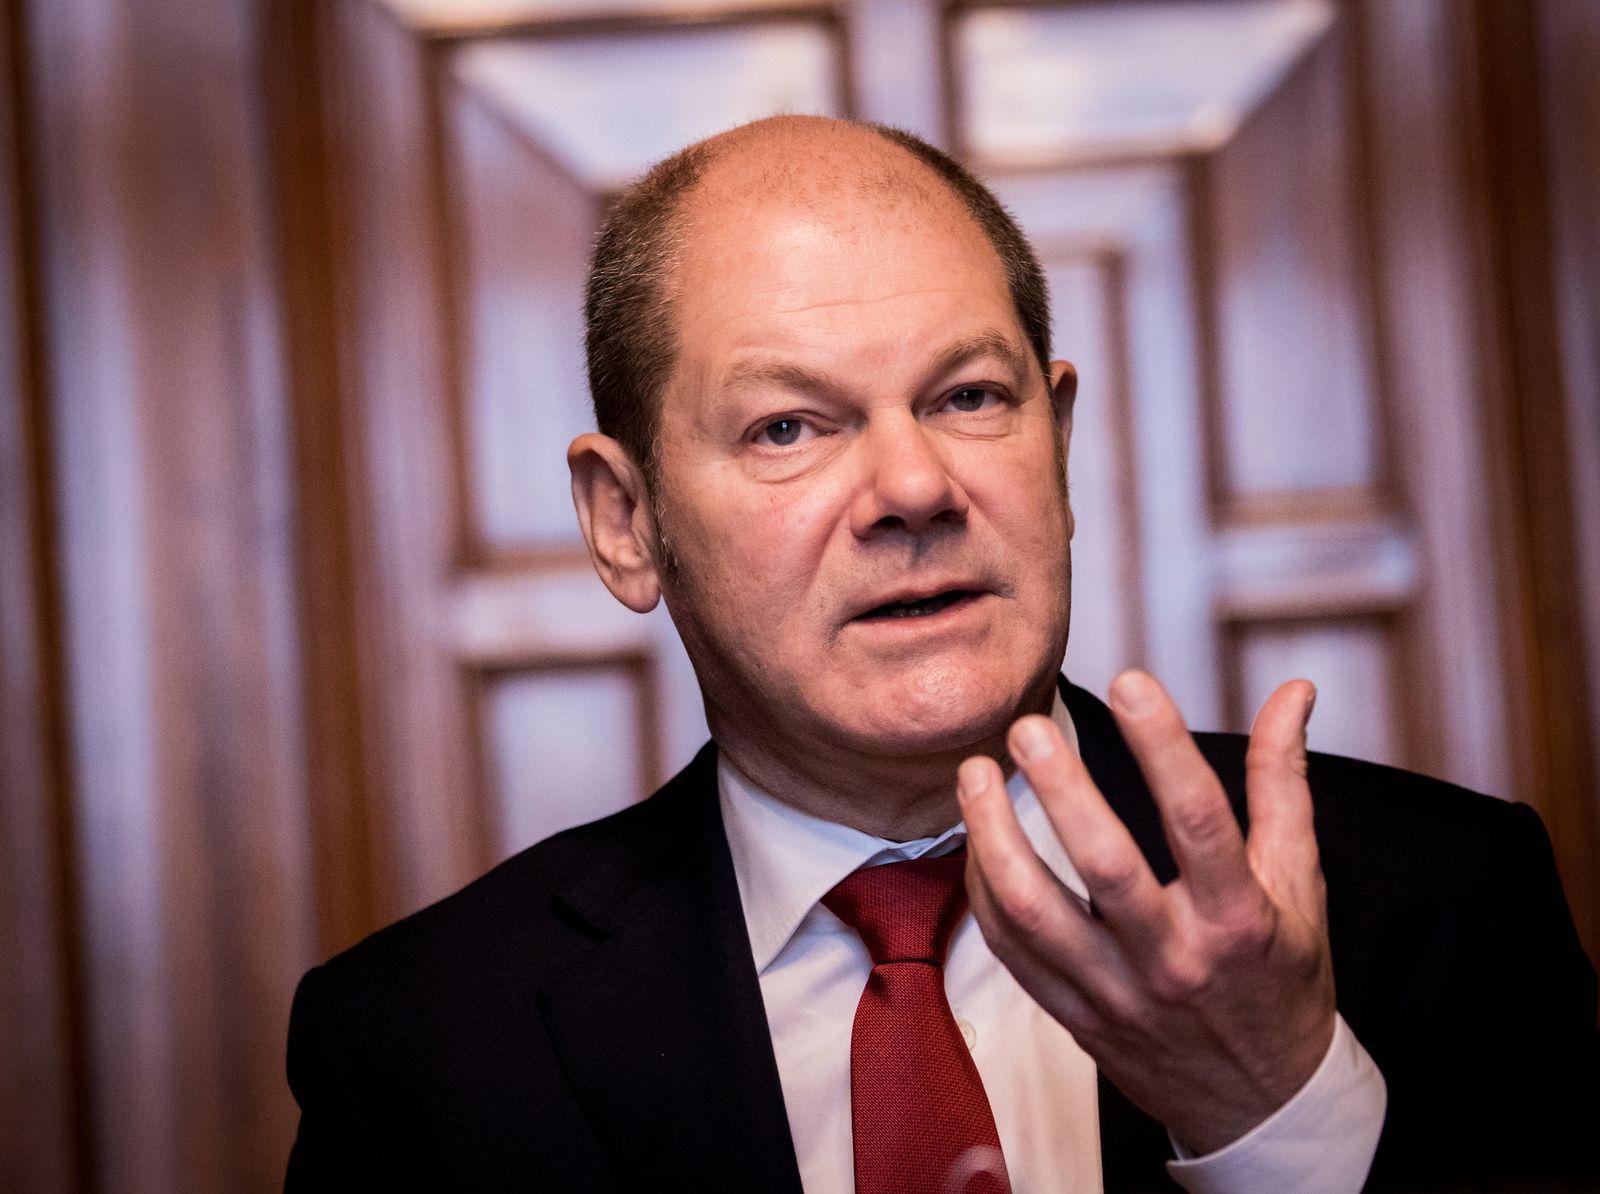 KoKo statt GrKo/ Hamburgs Erster Bürgermeister Olaf Scholz